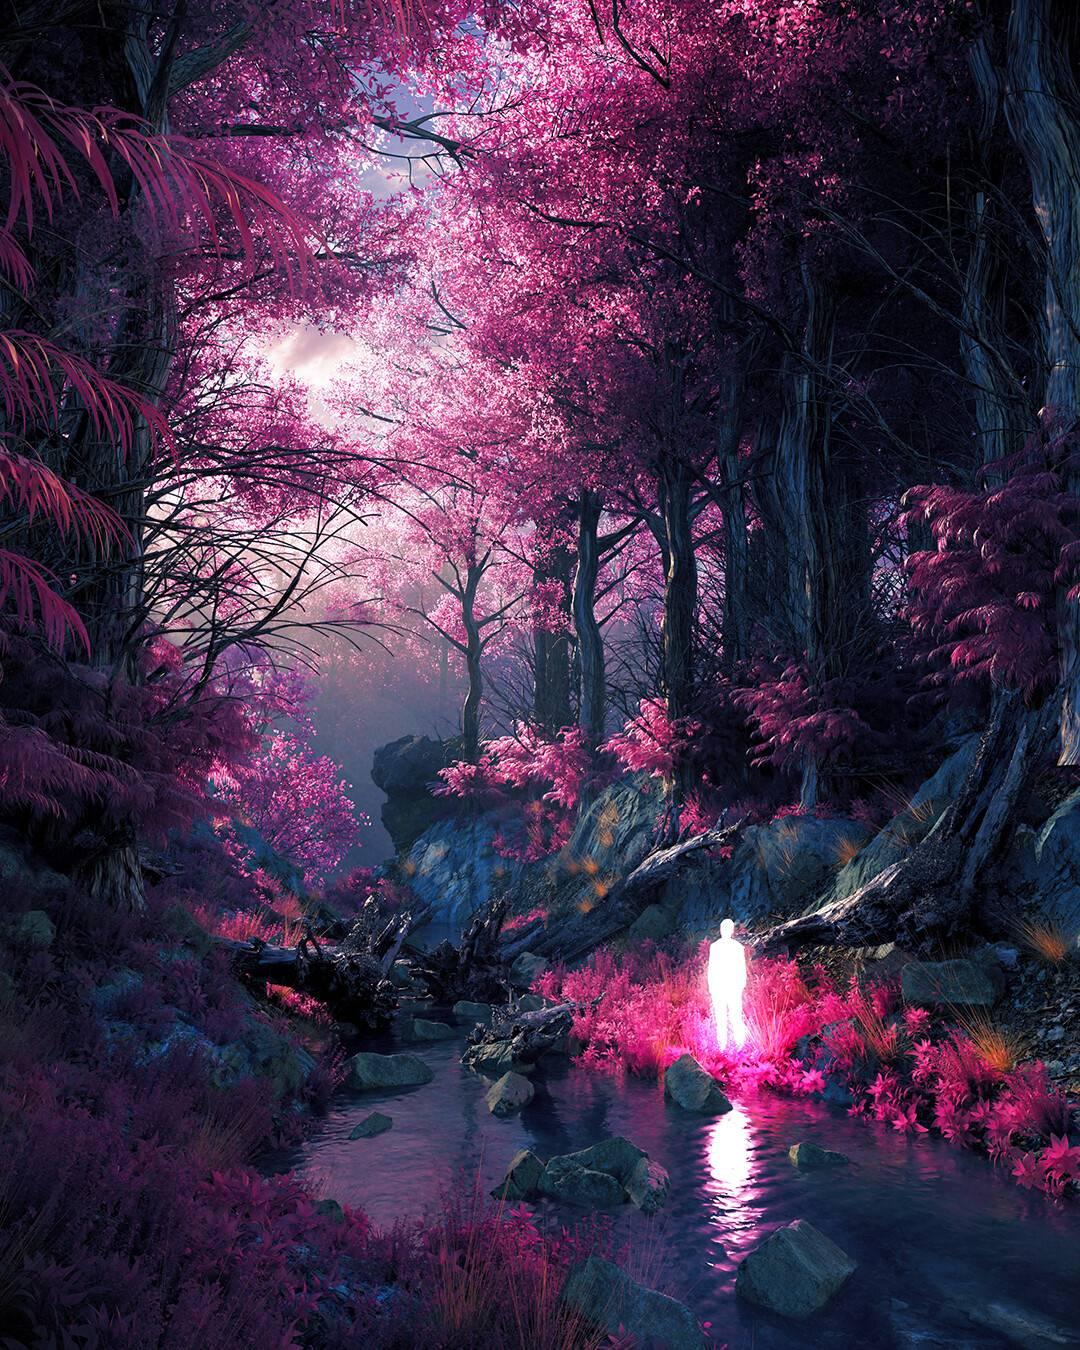 undergrowth-by-josh-pierce-a25575xazn-1080x1350.jpg